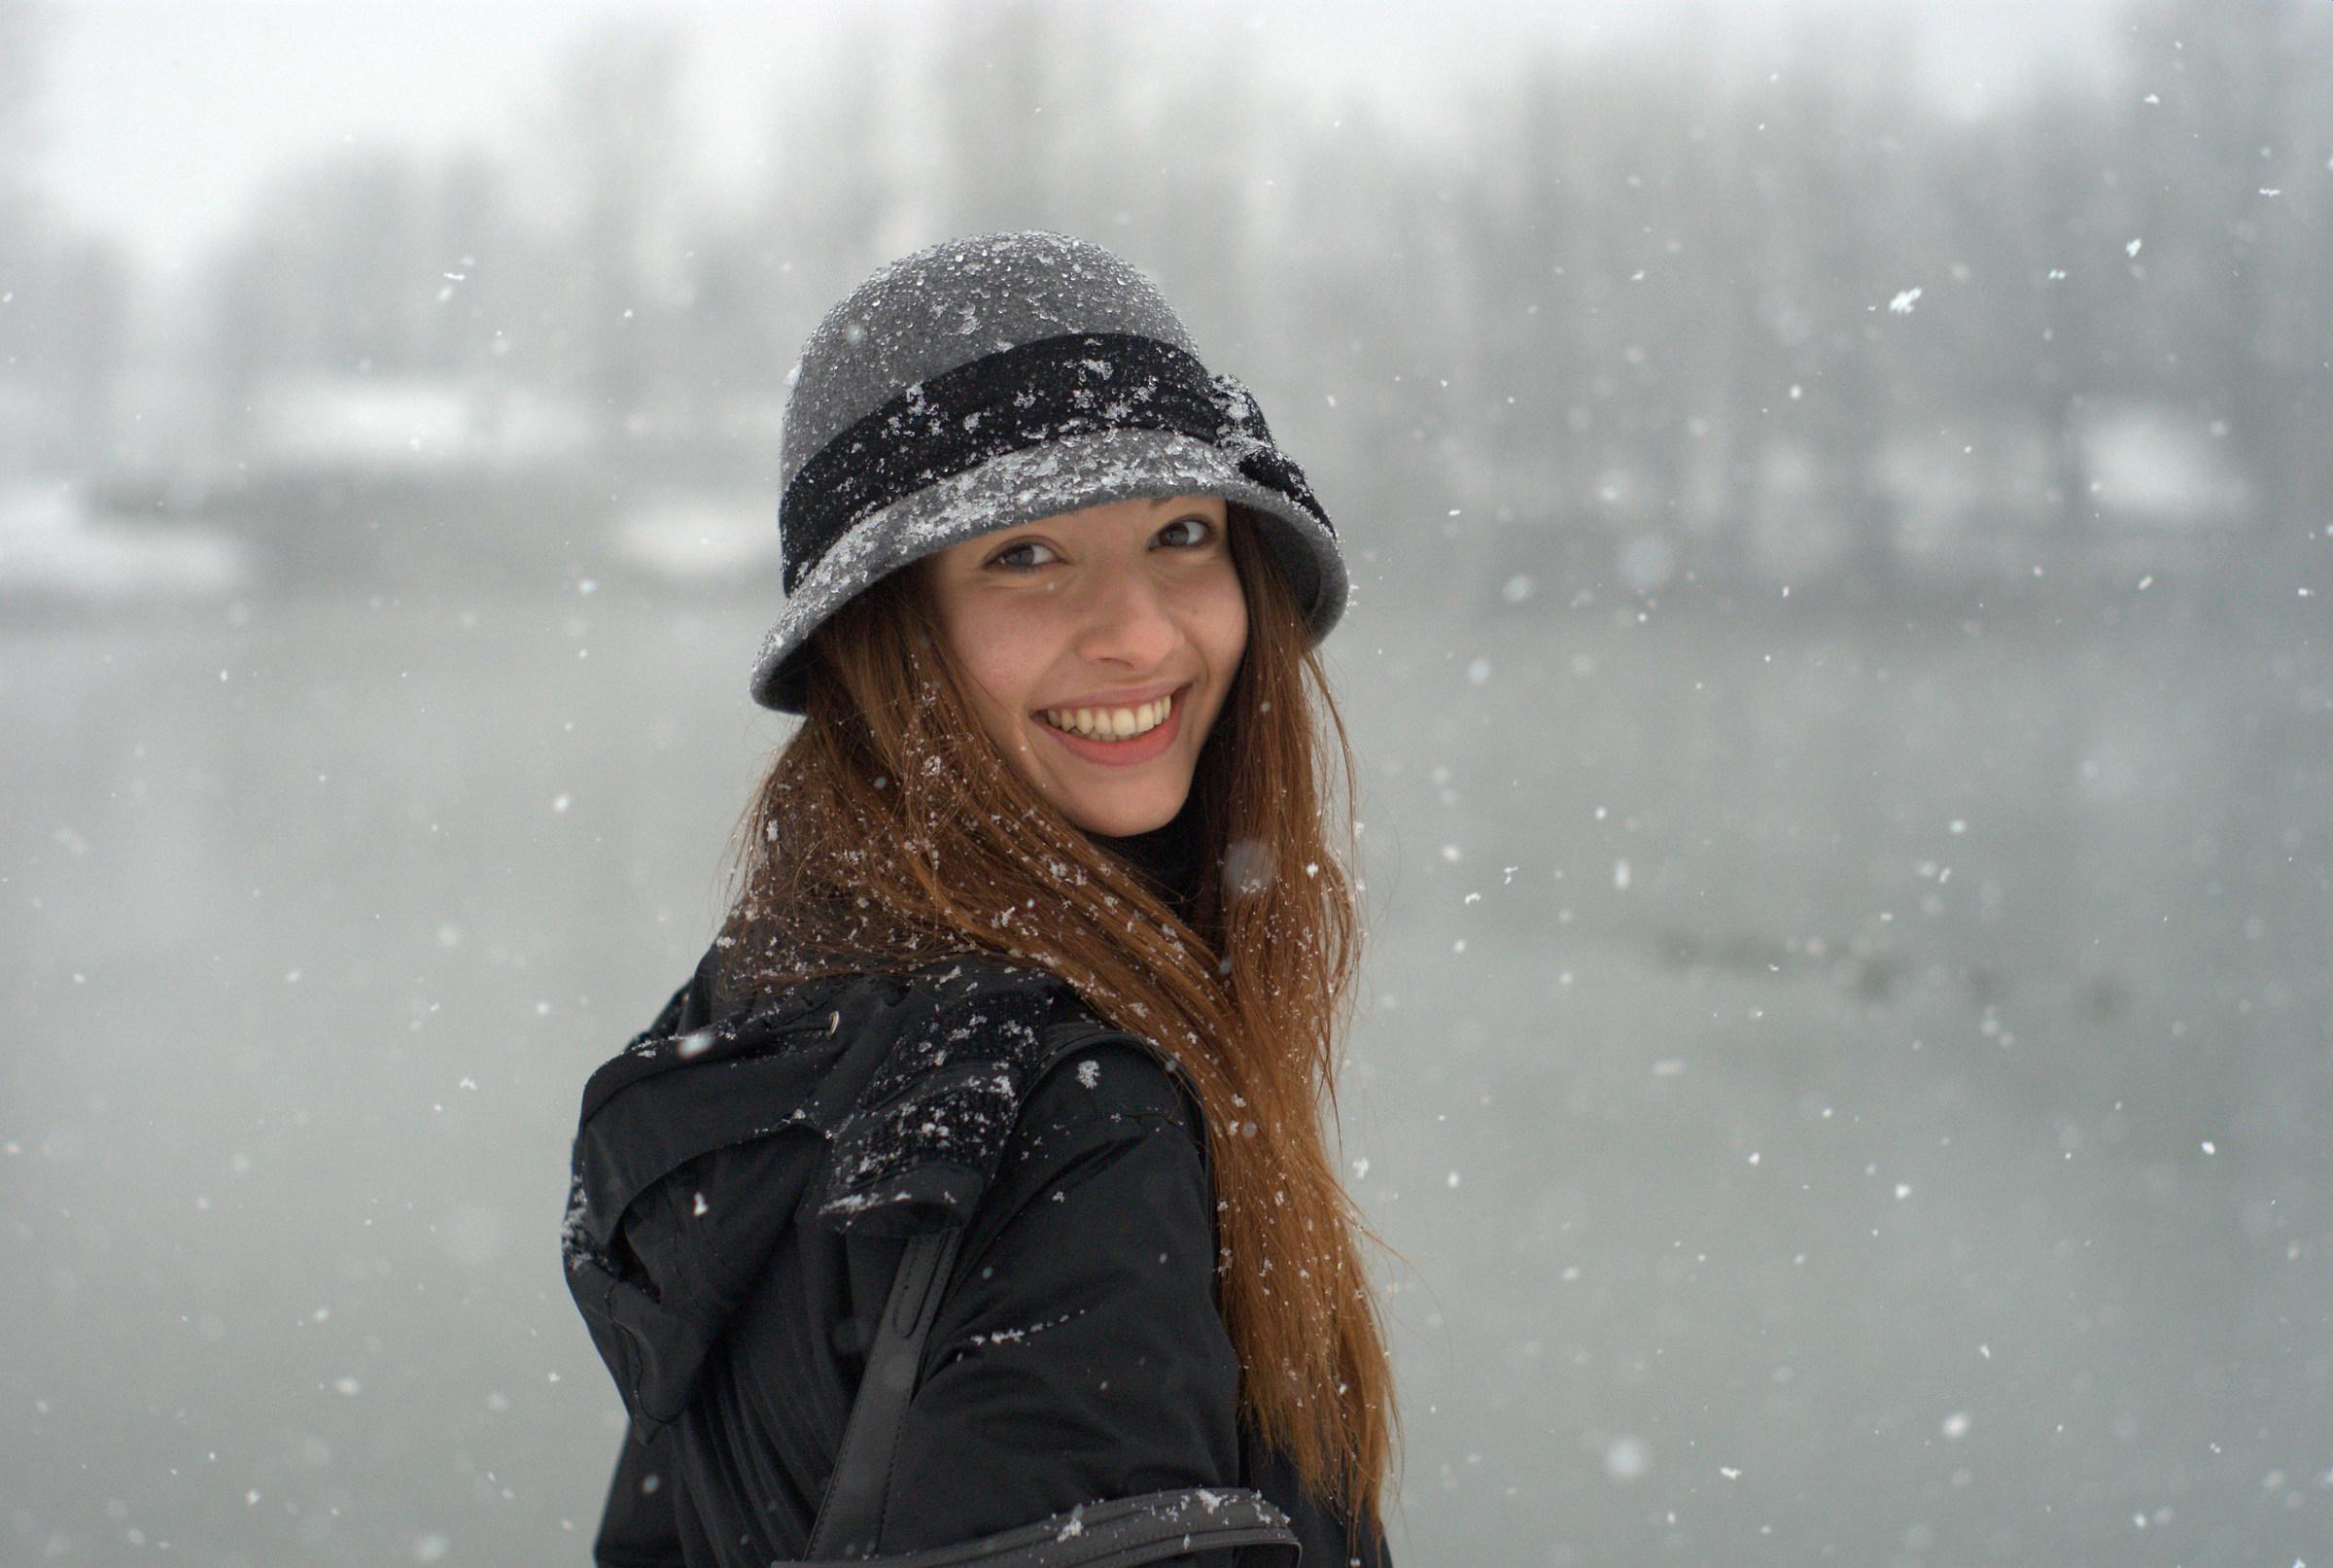 It's snowing!...